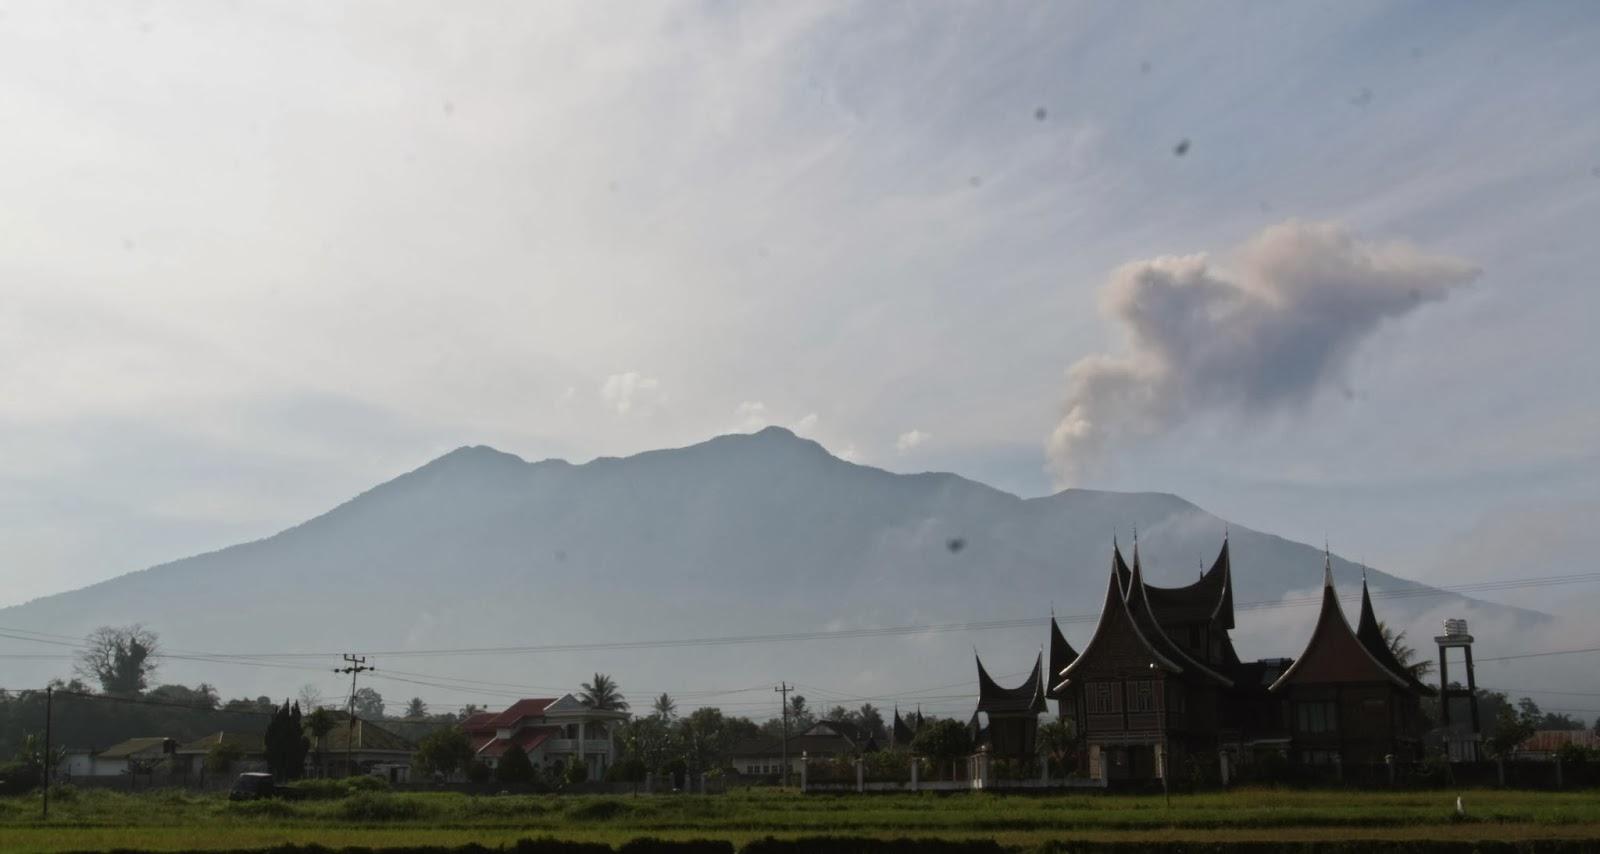 Gunung marapi sumatera barat meletus